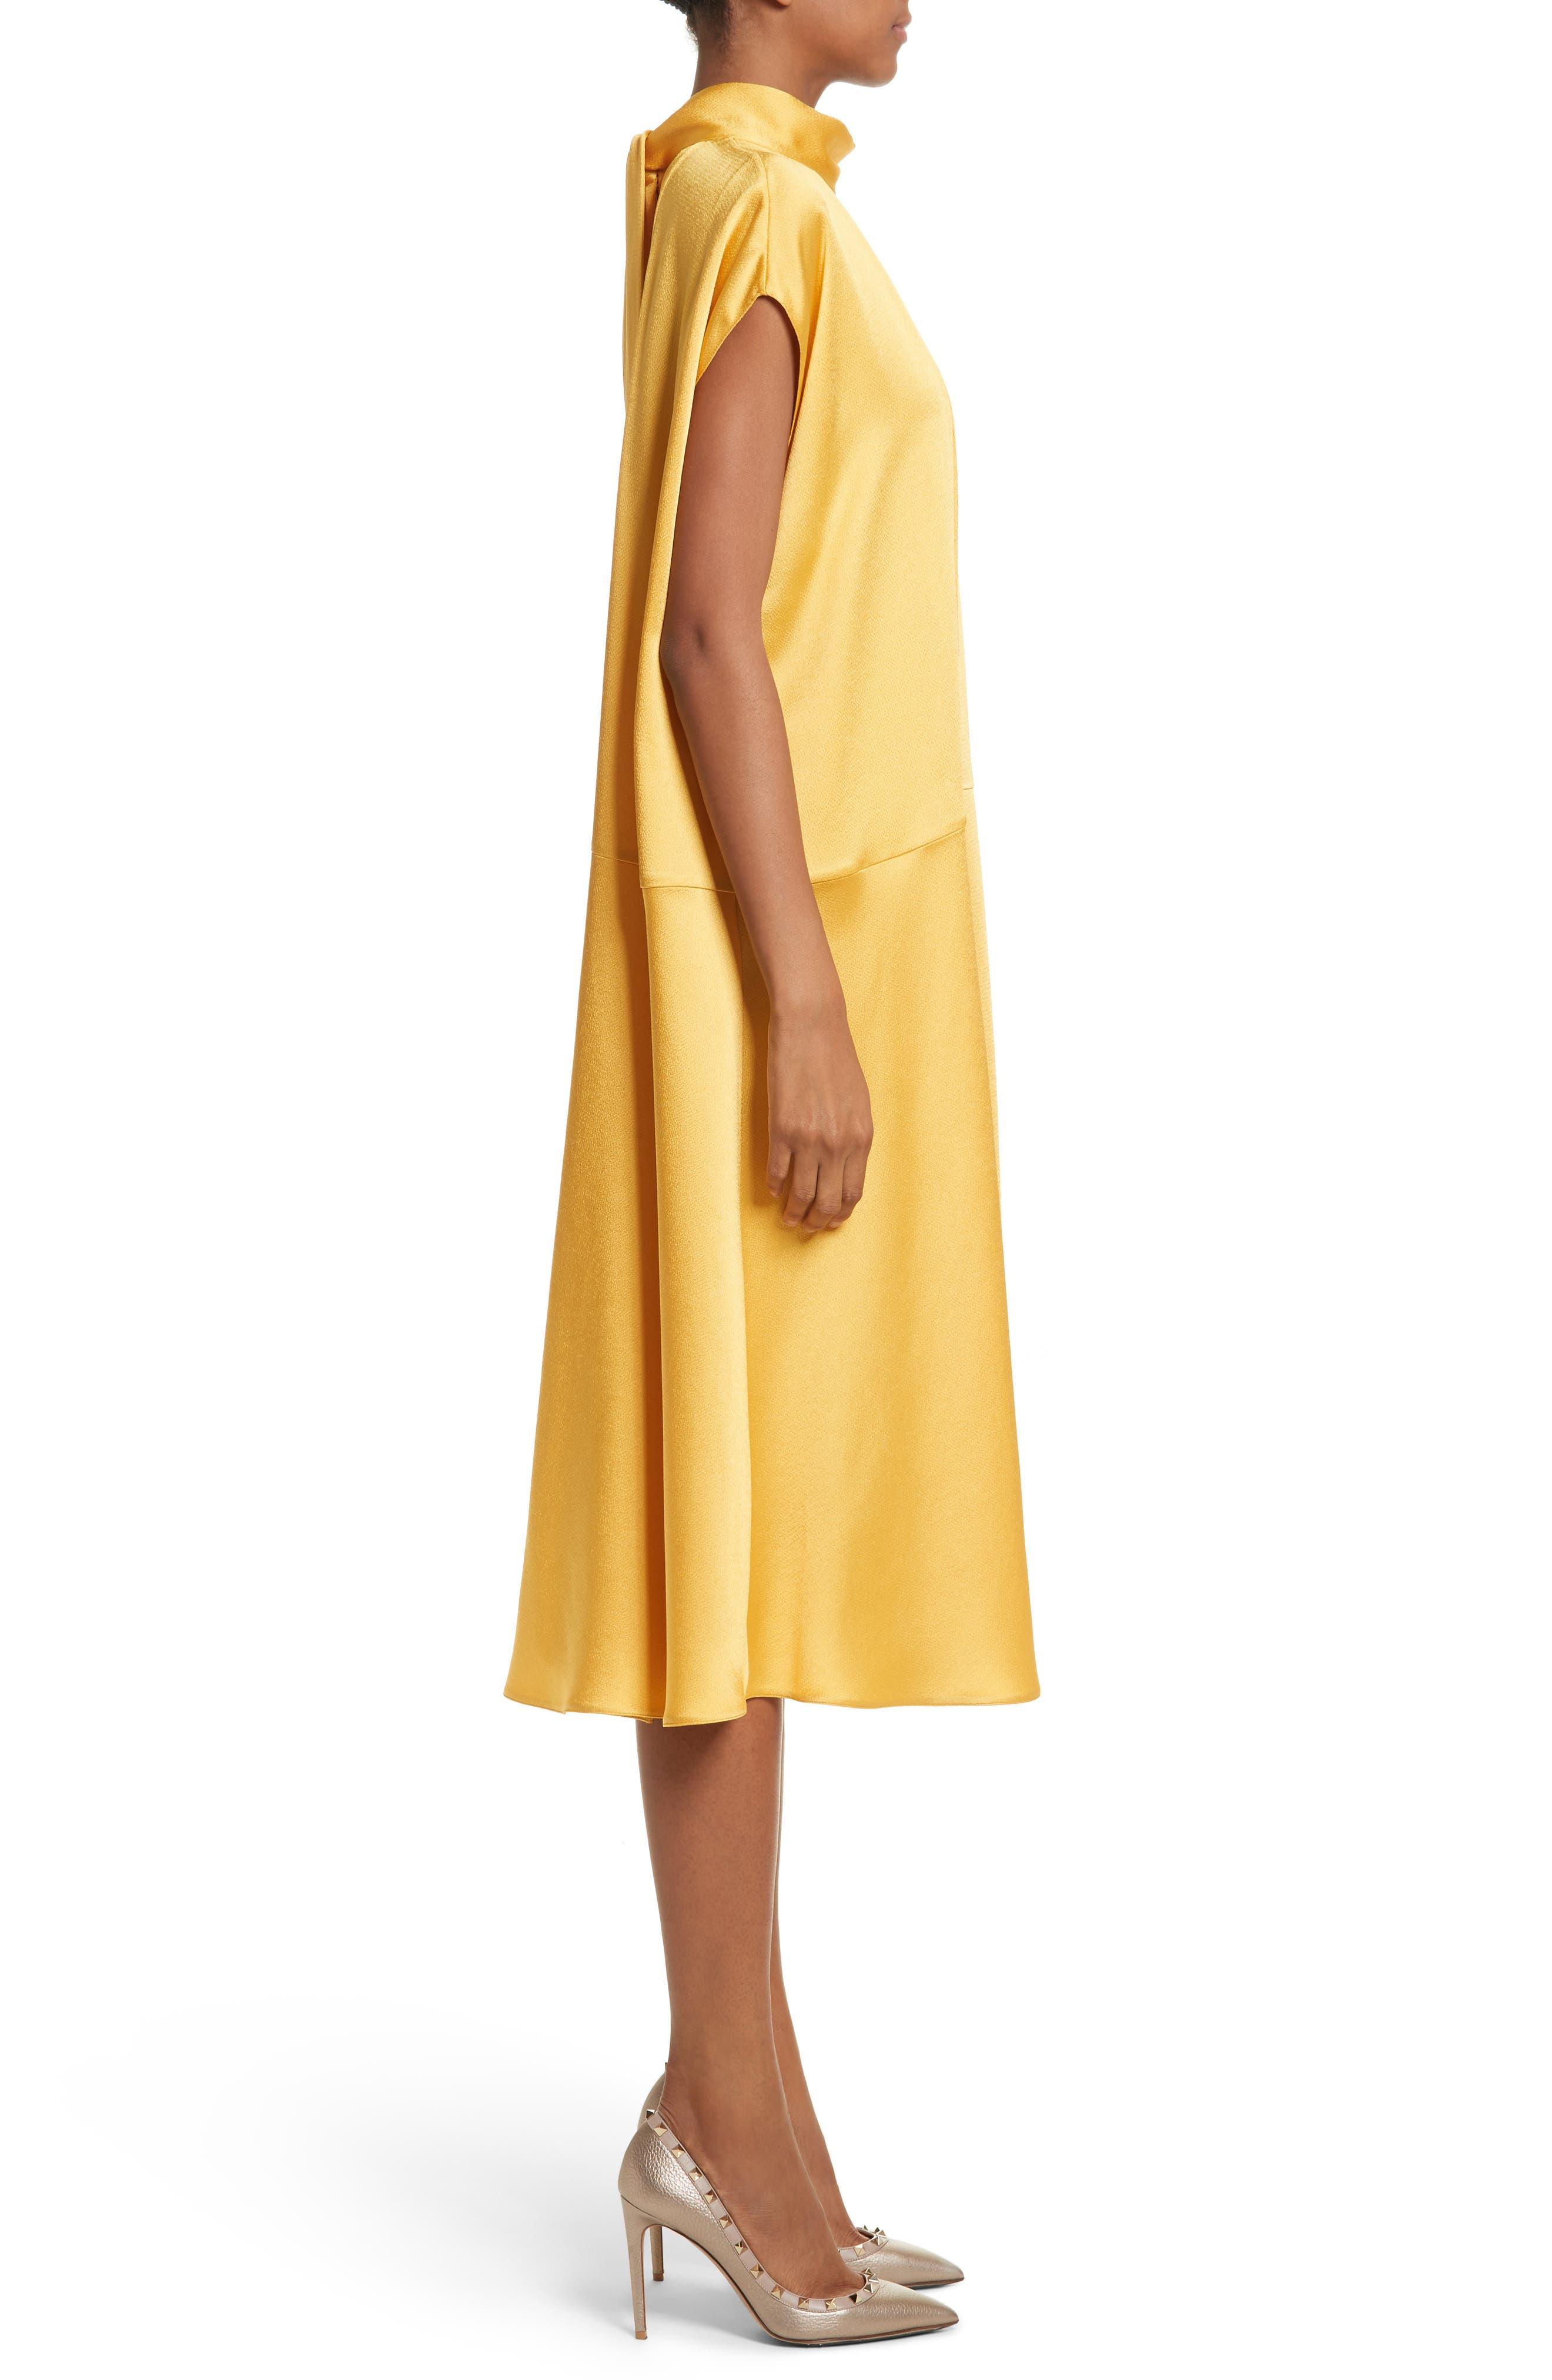 Hammered Satin Midi Dress,                             Alternate thumbnail 4, color,                             Canary Yellow